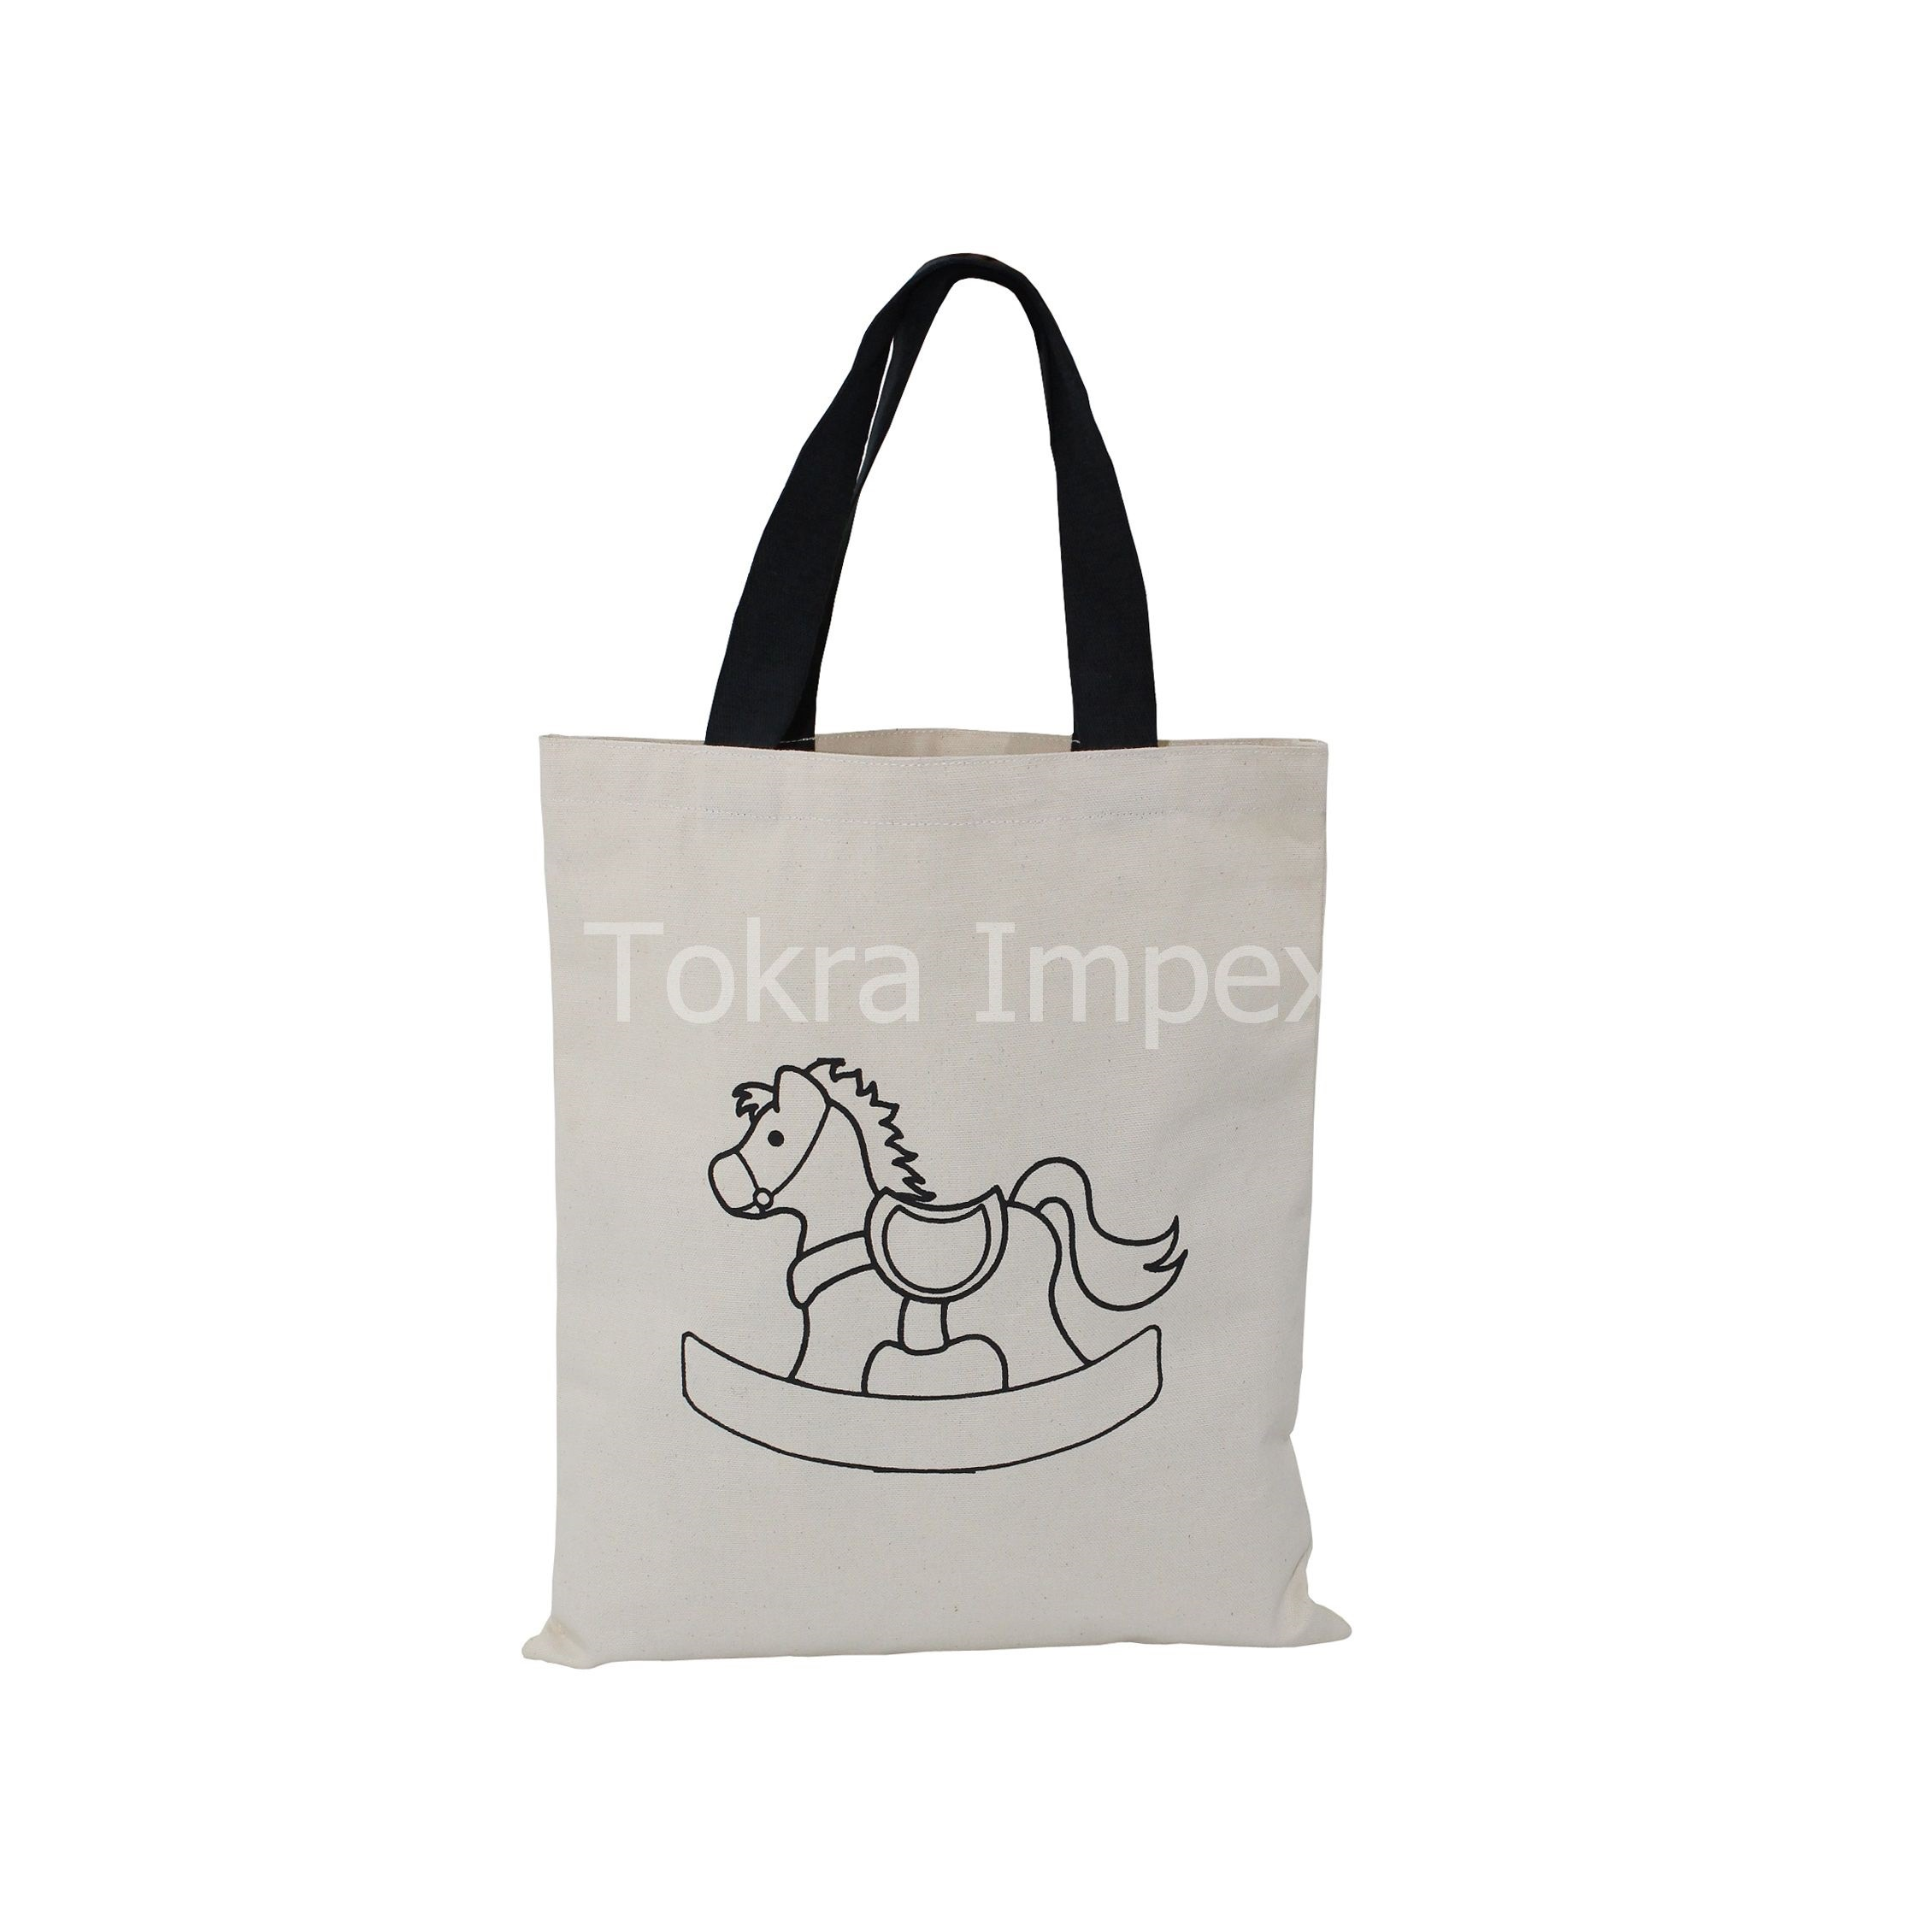 10 Oz Natural Canvas Bag With Web Handle